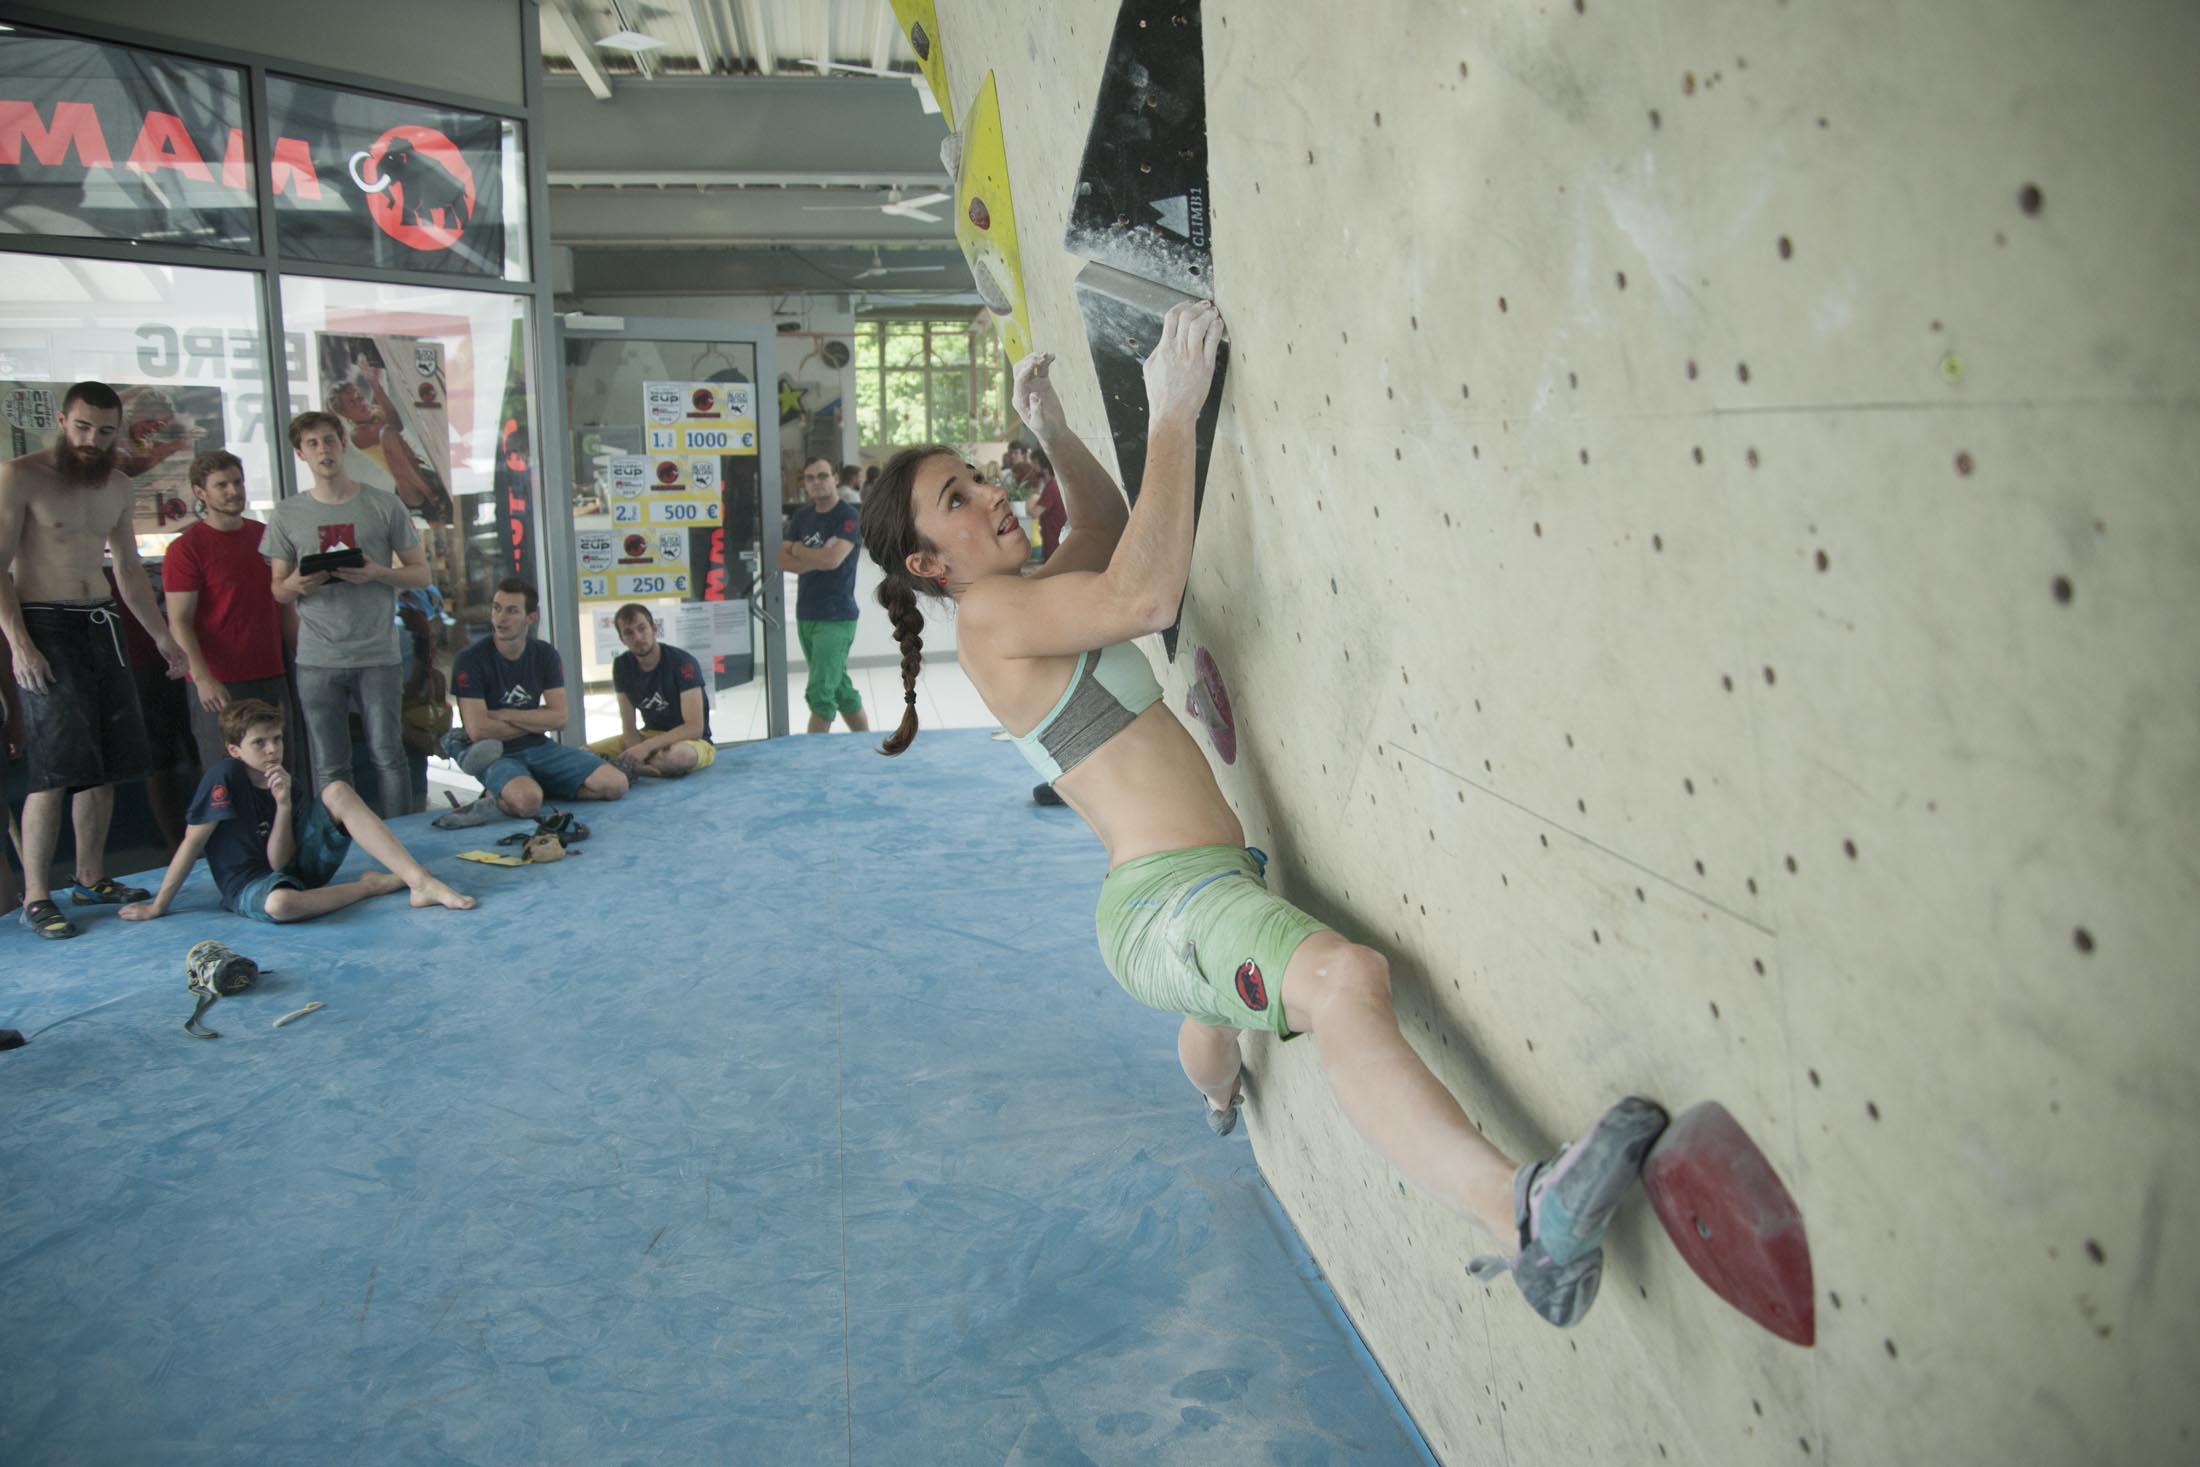 Quali, internationaler bouldercup Frankenjura 2016, BLOCKHELDEN Erlangen, Mammut, Bergfreunde.de, Boulderwettkampf07092016344